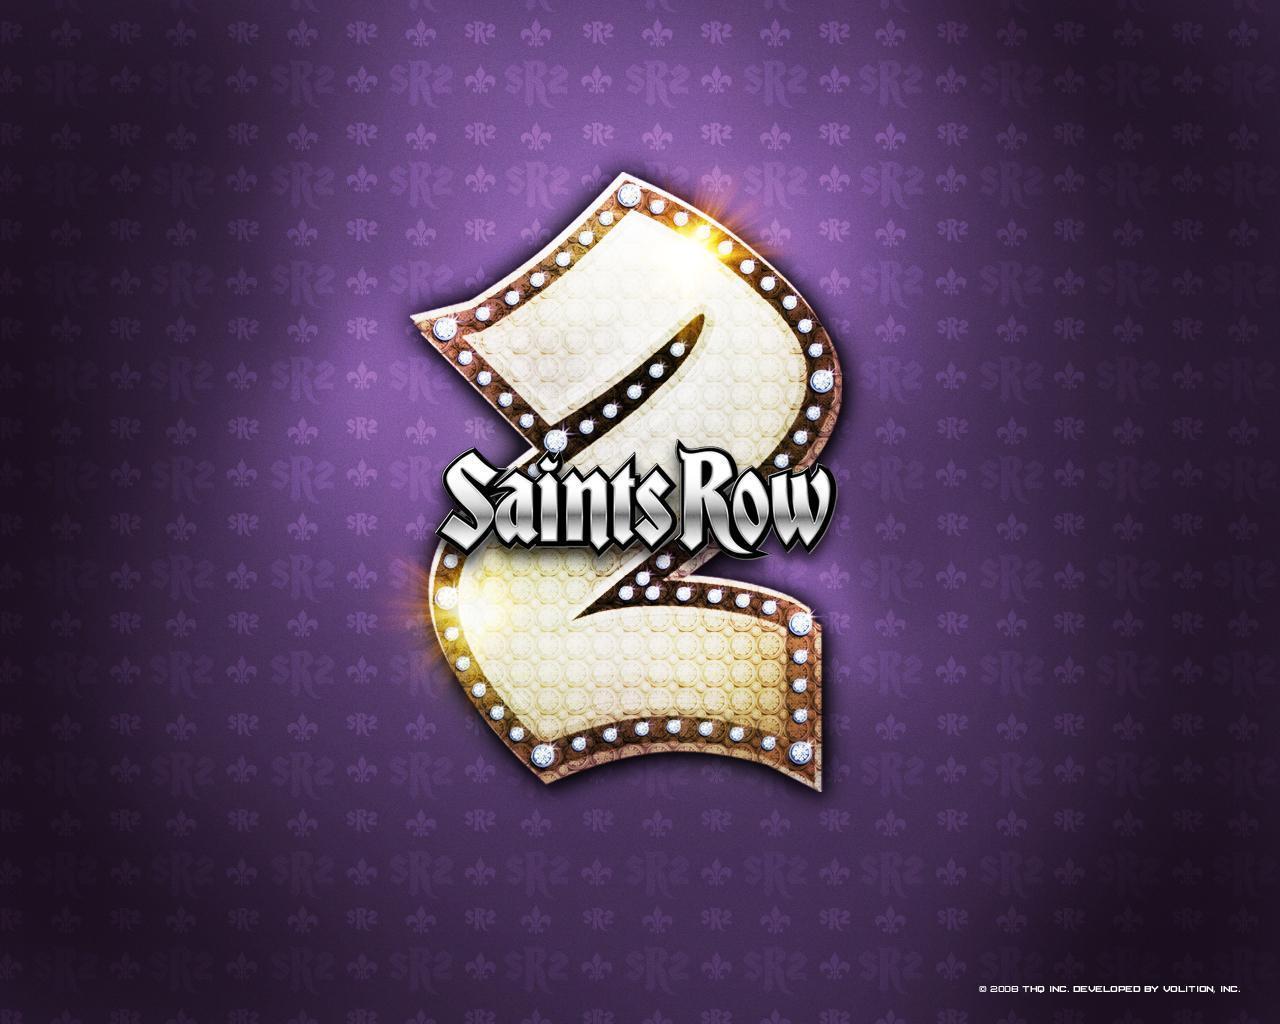 saints row 2 wallpapers wallpaper cave